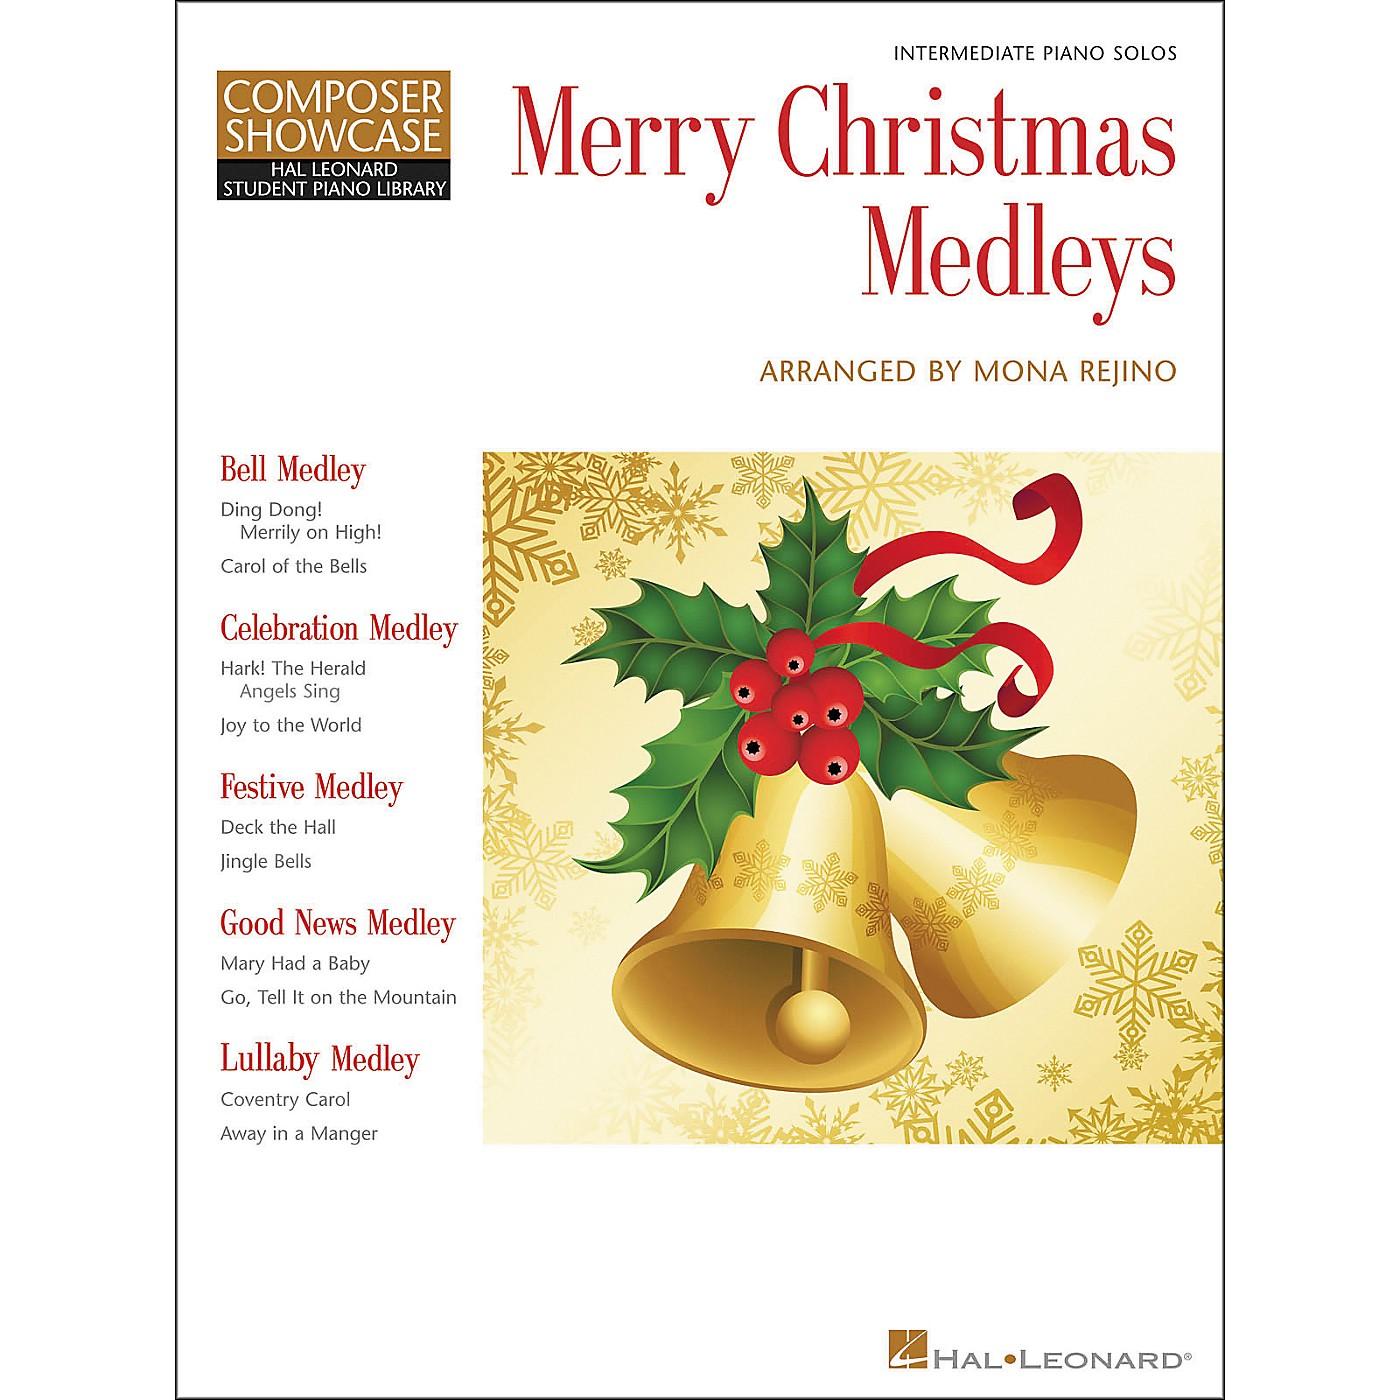 Hal Leonard Merry Christmas Medleys - Composer Showcase Intermediate Piano Solos Hal Leonard Student Piano Library by Mona Rejino thumbnail